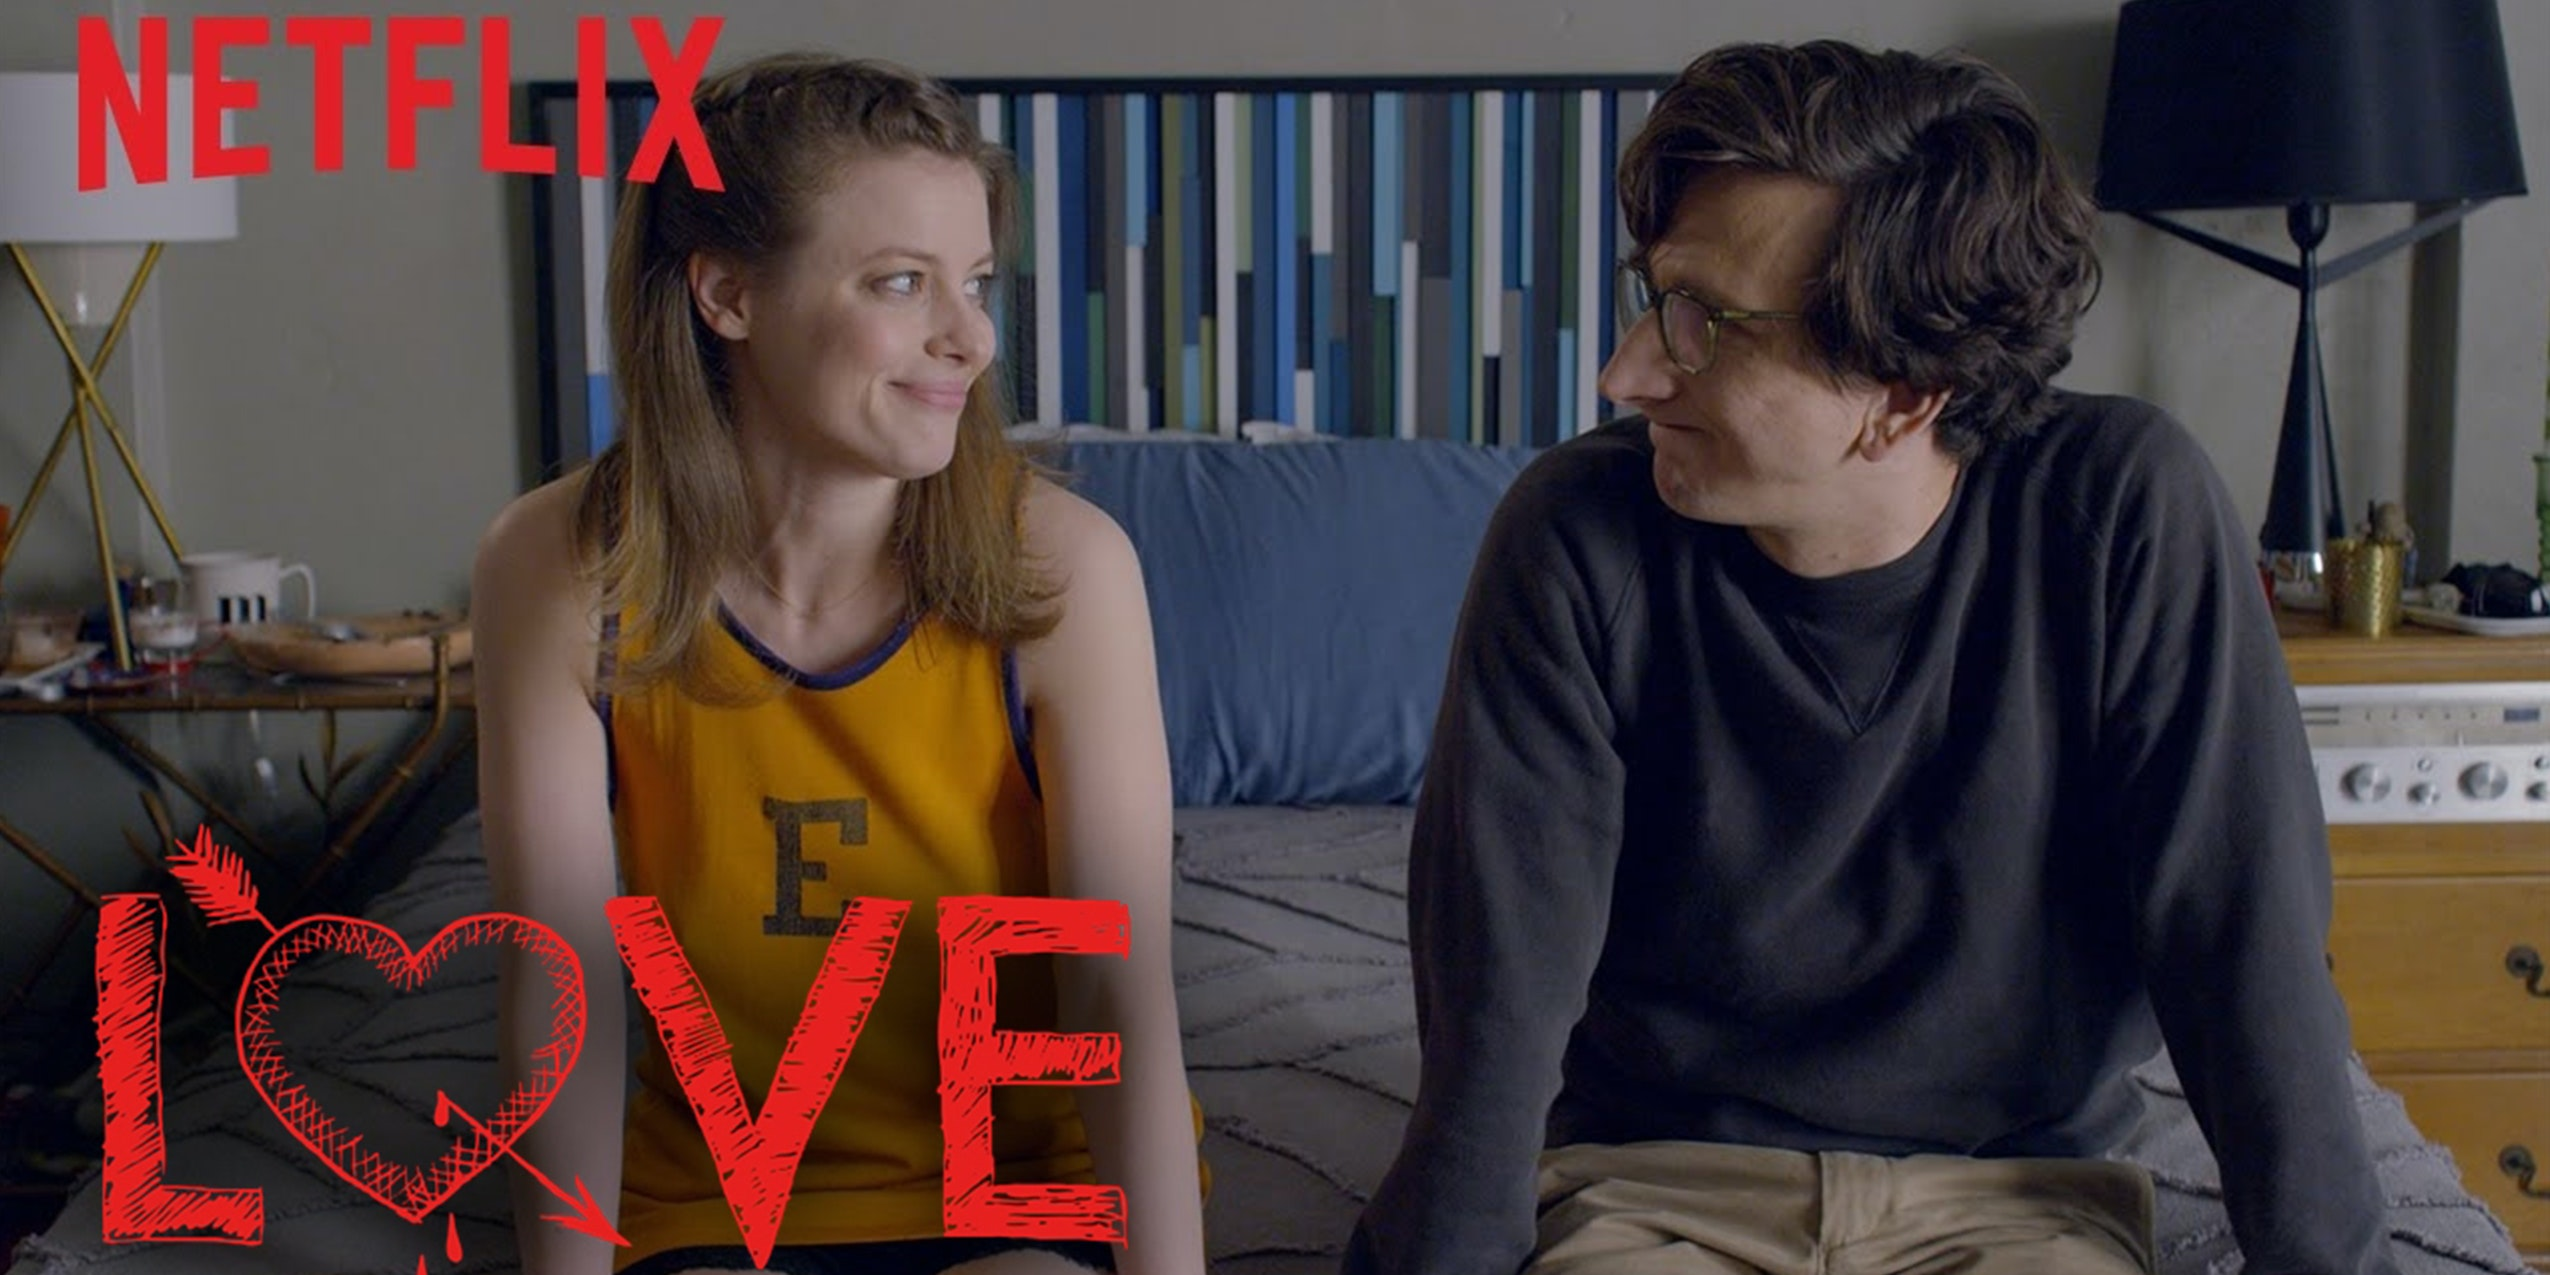 love Netflix original series